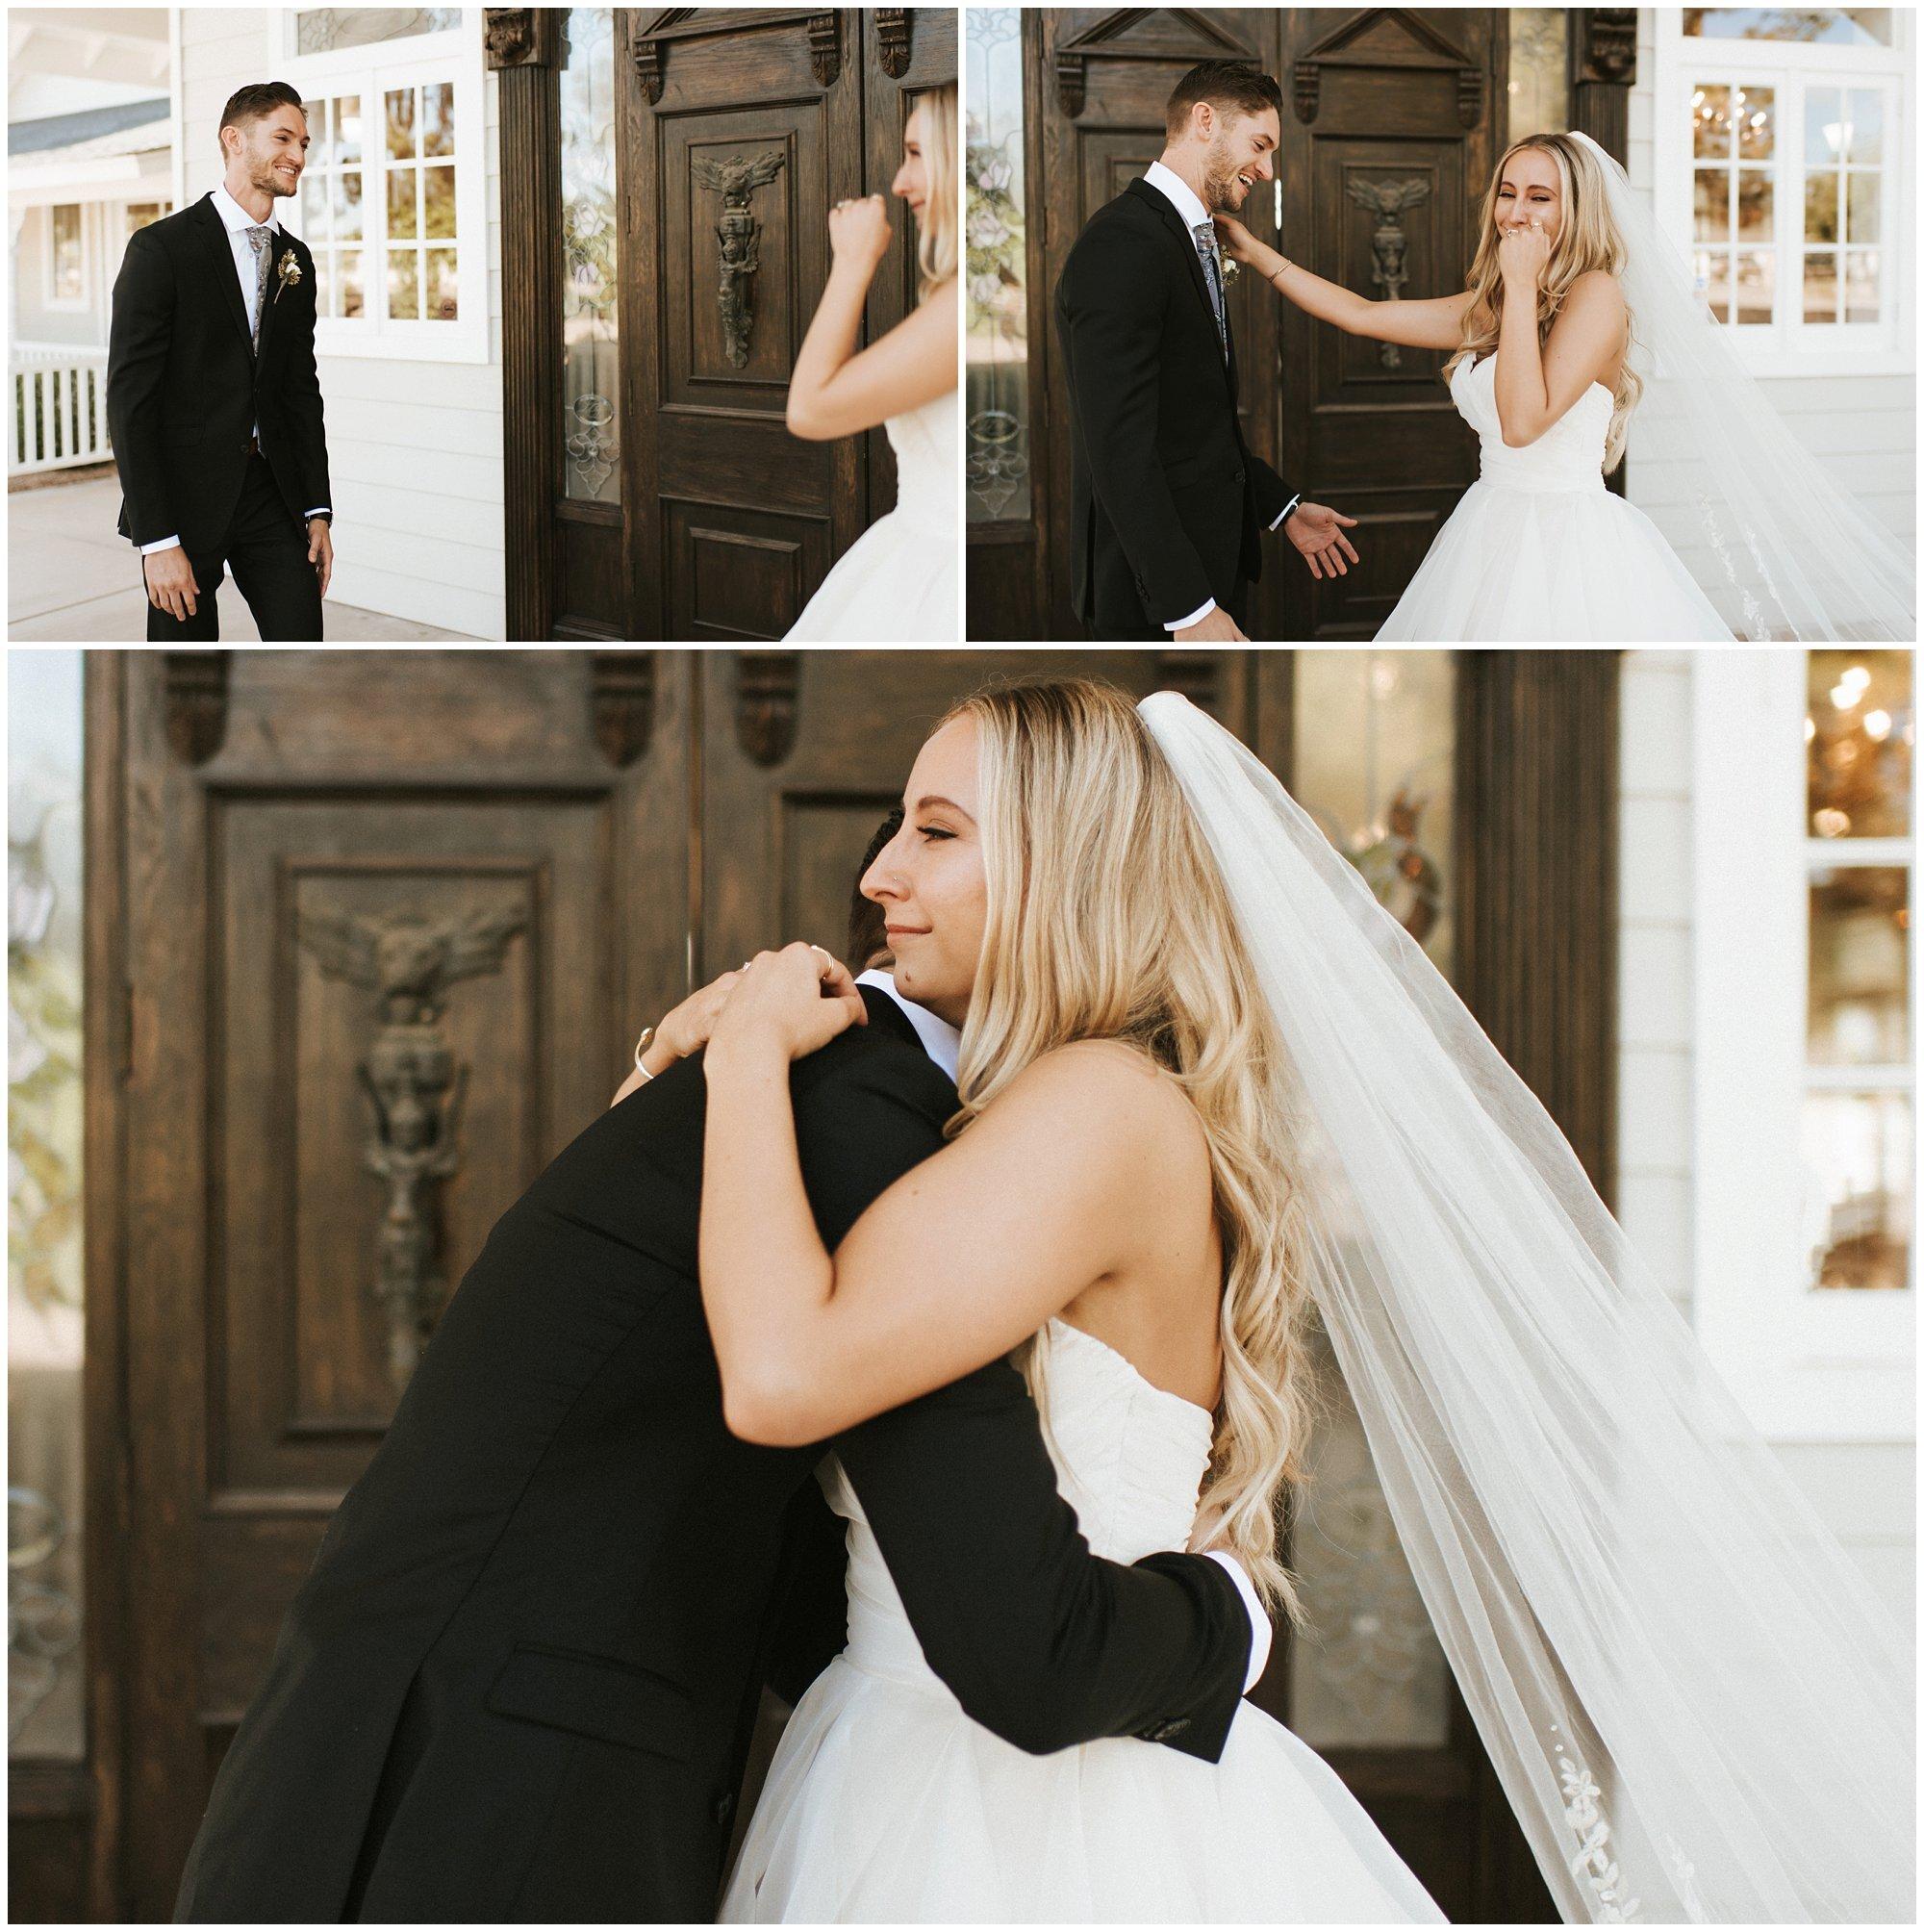 Wedgewood_Lindsay_Groves-Arizona-Wedding-Photographer-M+C_0010.jpg